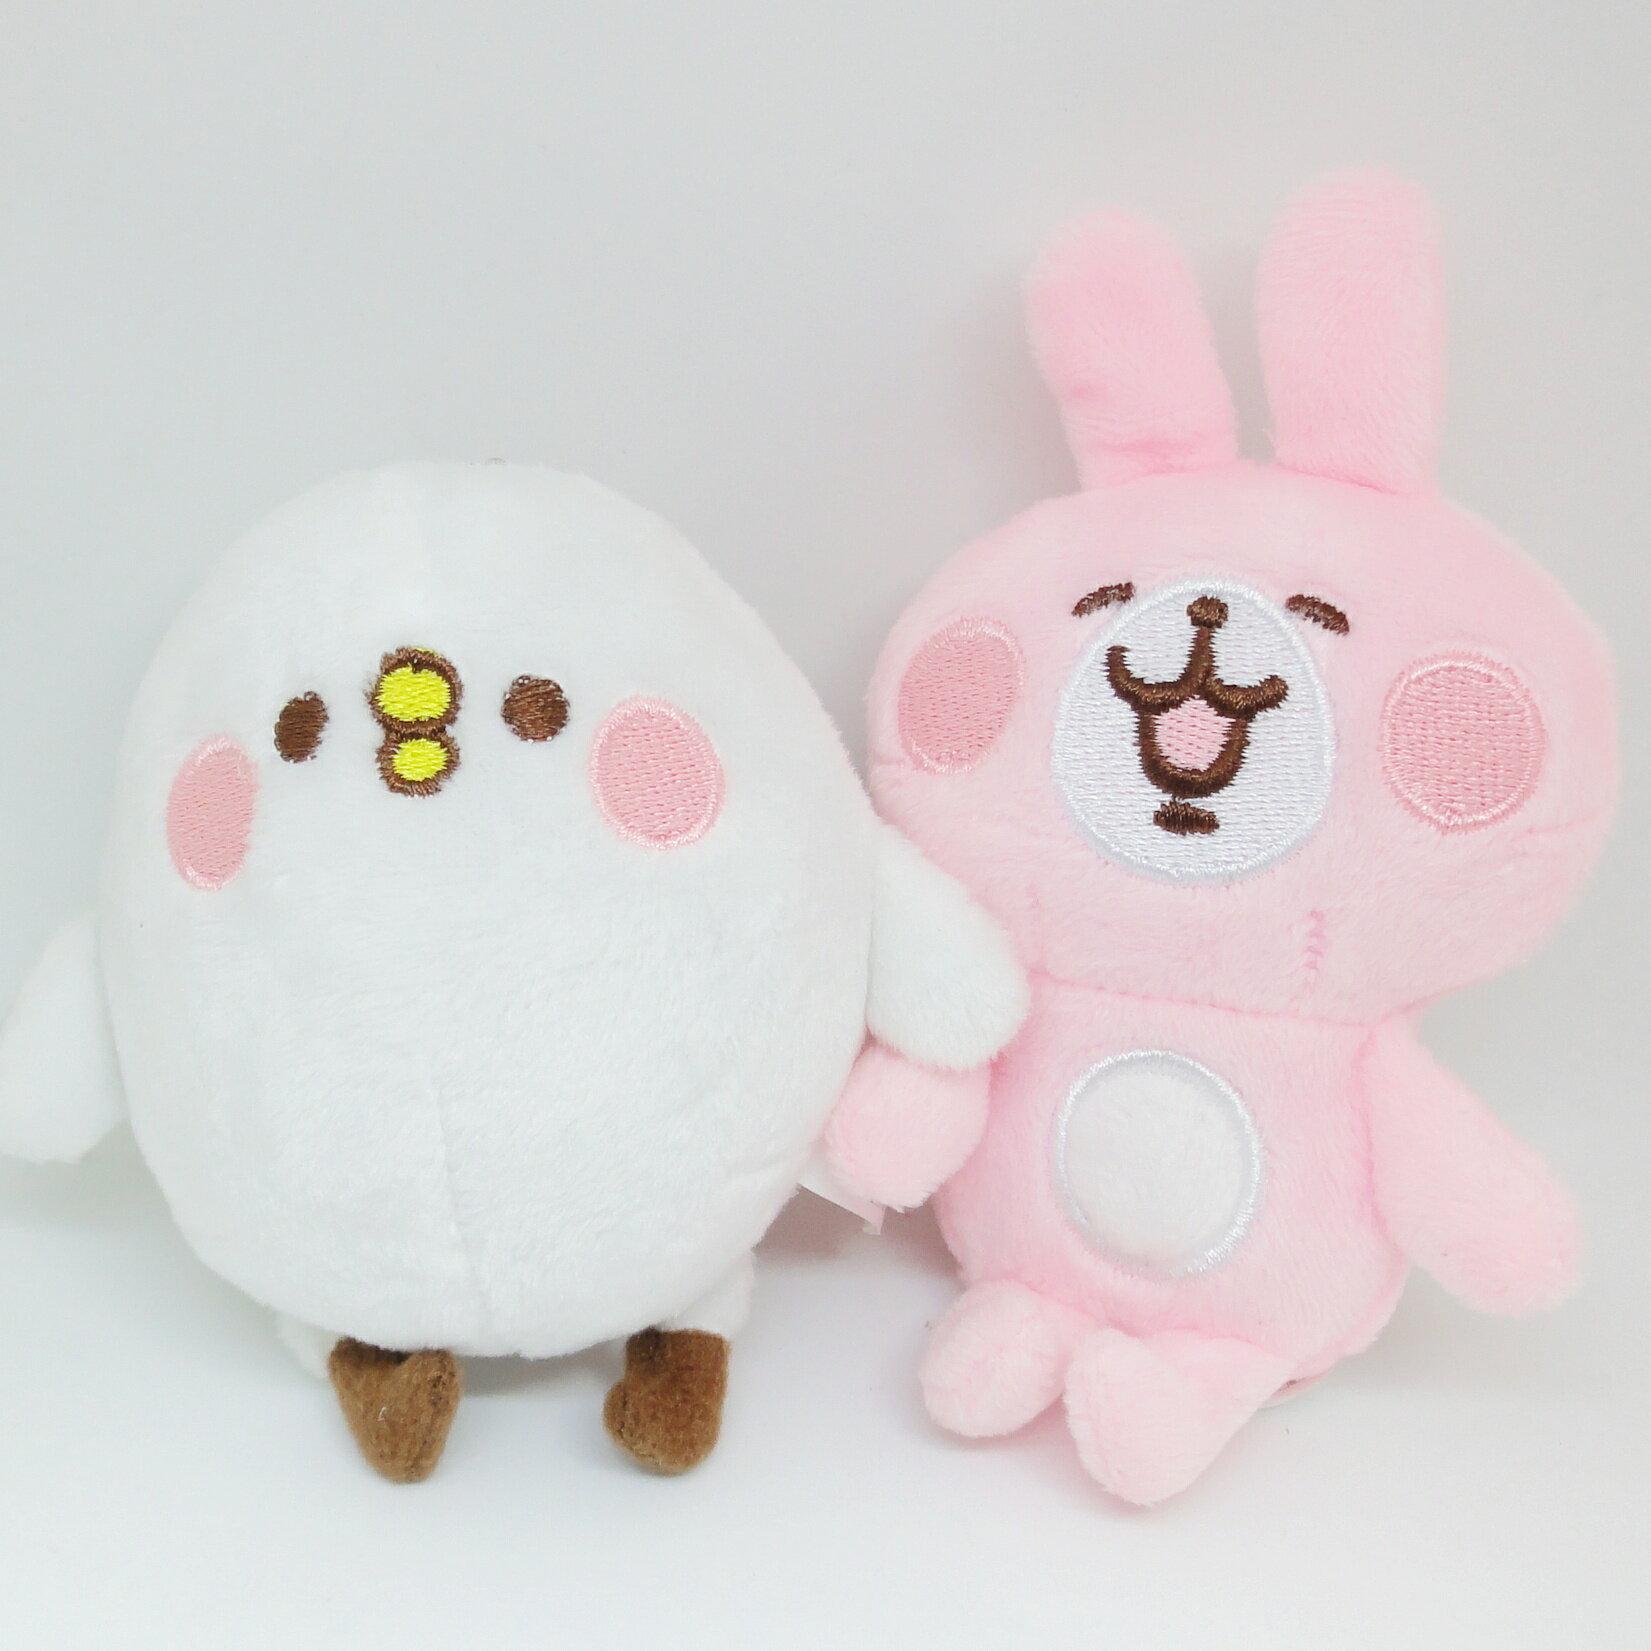 【UNIPRO】Kanahei 卡娜赫拉的小動物 小雞P助 粉紅兔兔 絨毛玩偶 娃娃 珠鍊吊飾 三貝多正版授權 禮物